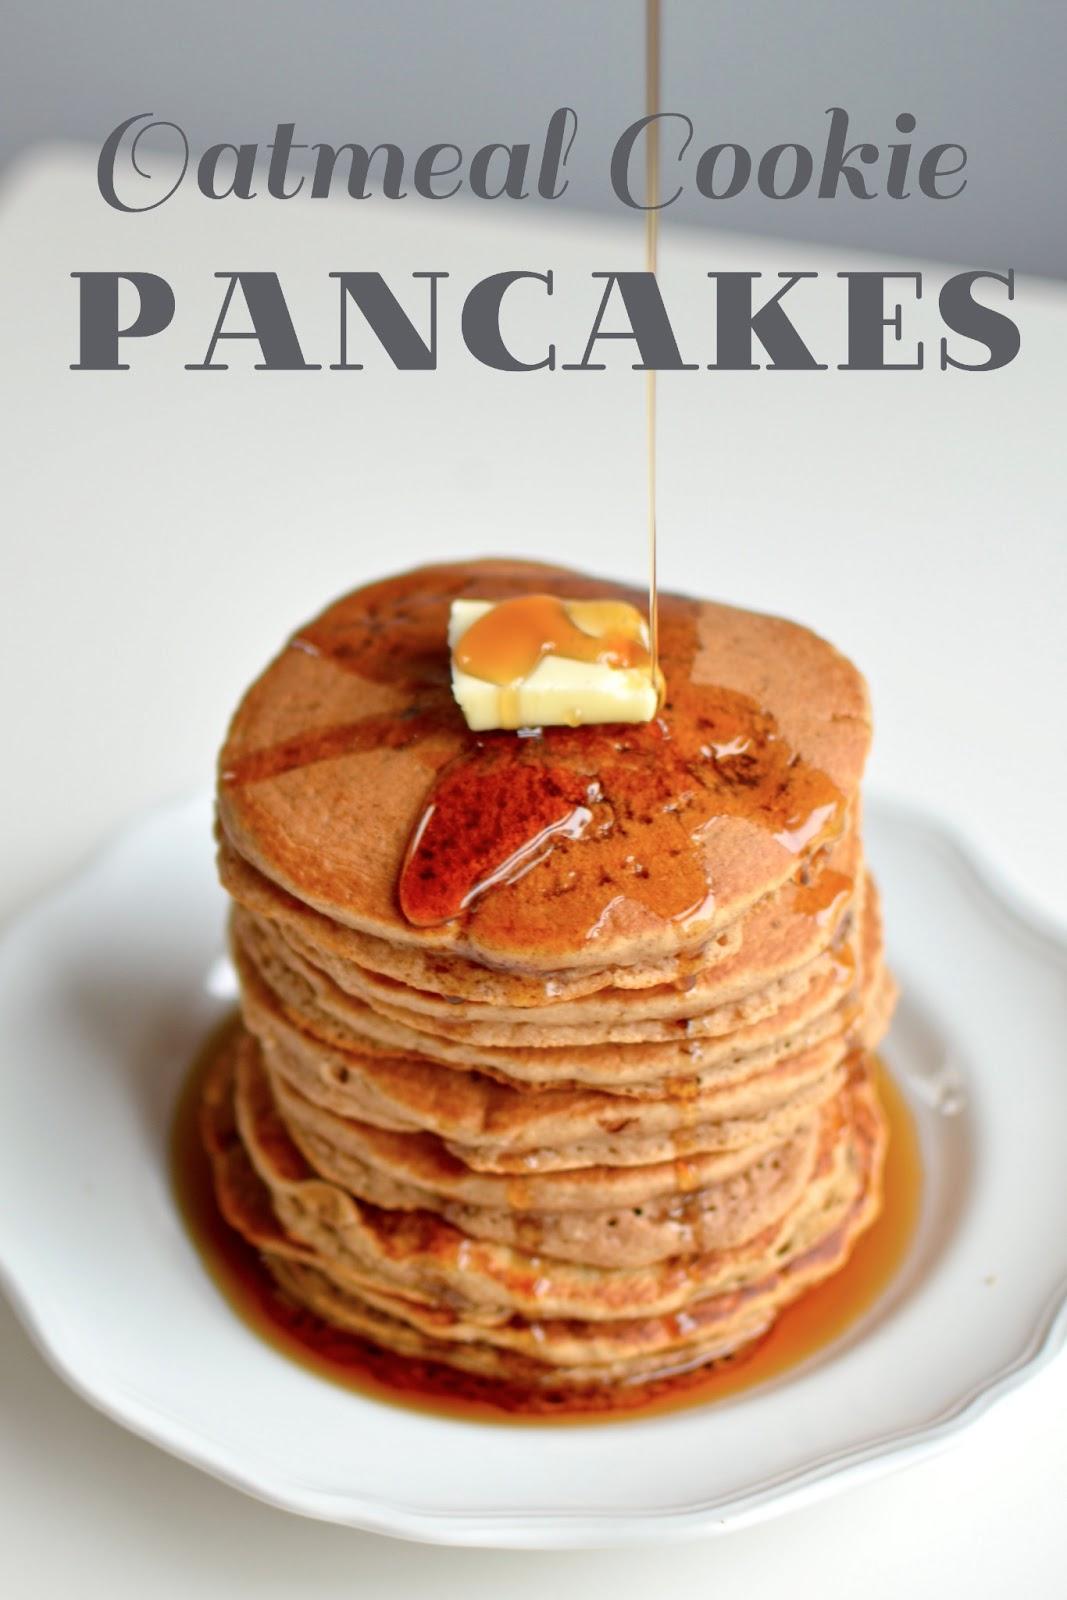 Yammie's Glutenfreedom: Oatmeal Cookie Pancakes